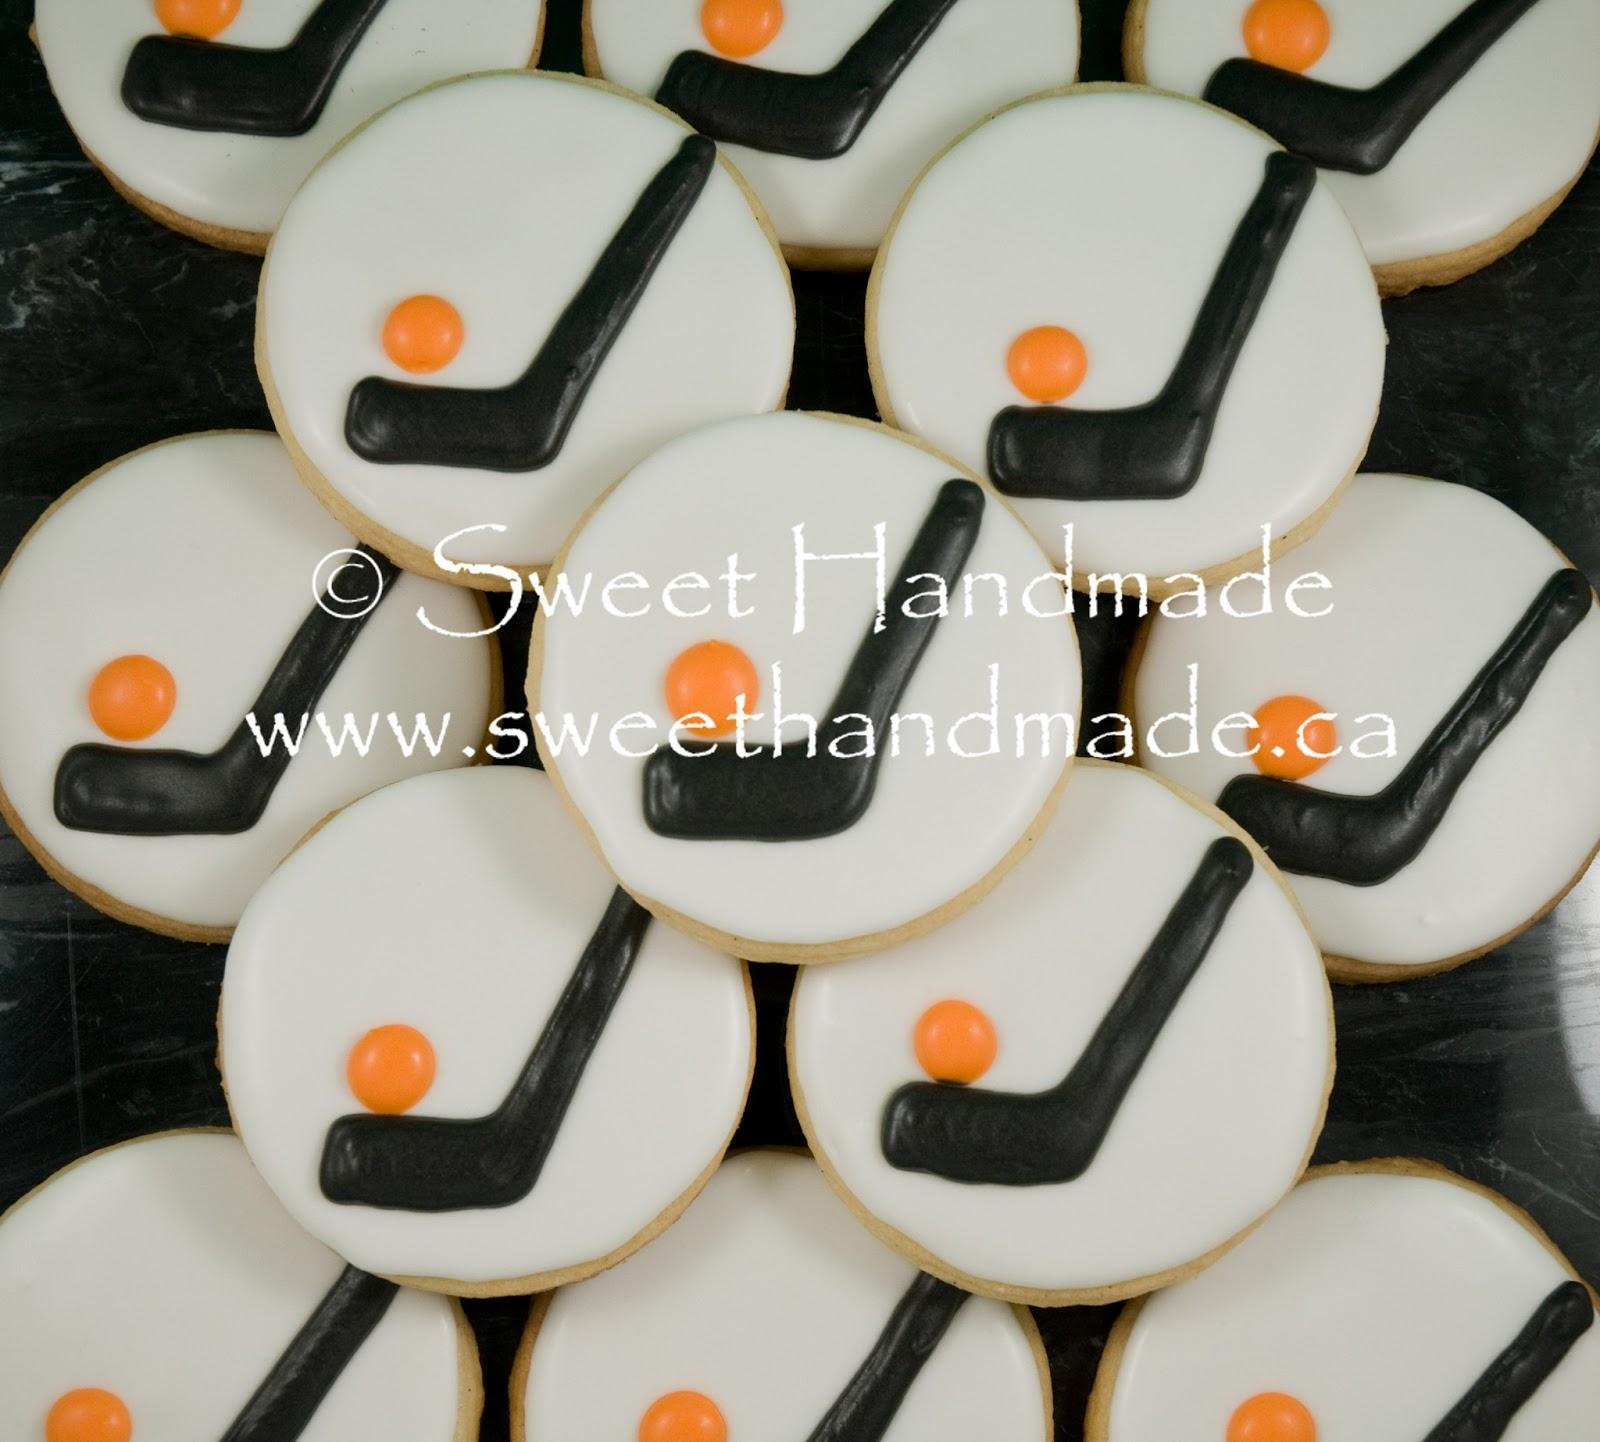 Sweet Handmade Cookies: Ball Hockey Tournament Cookies